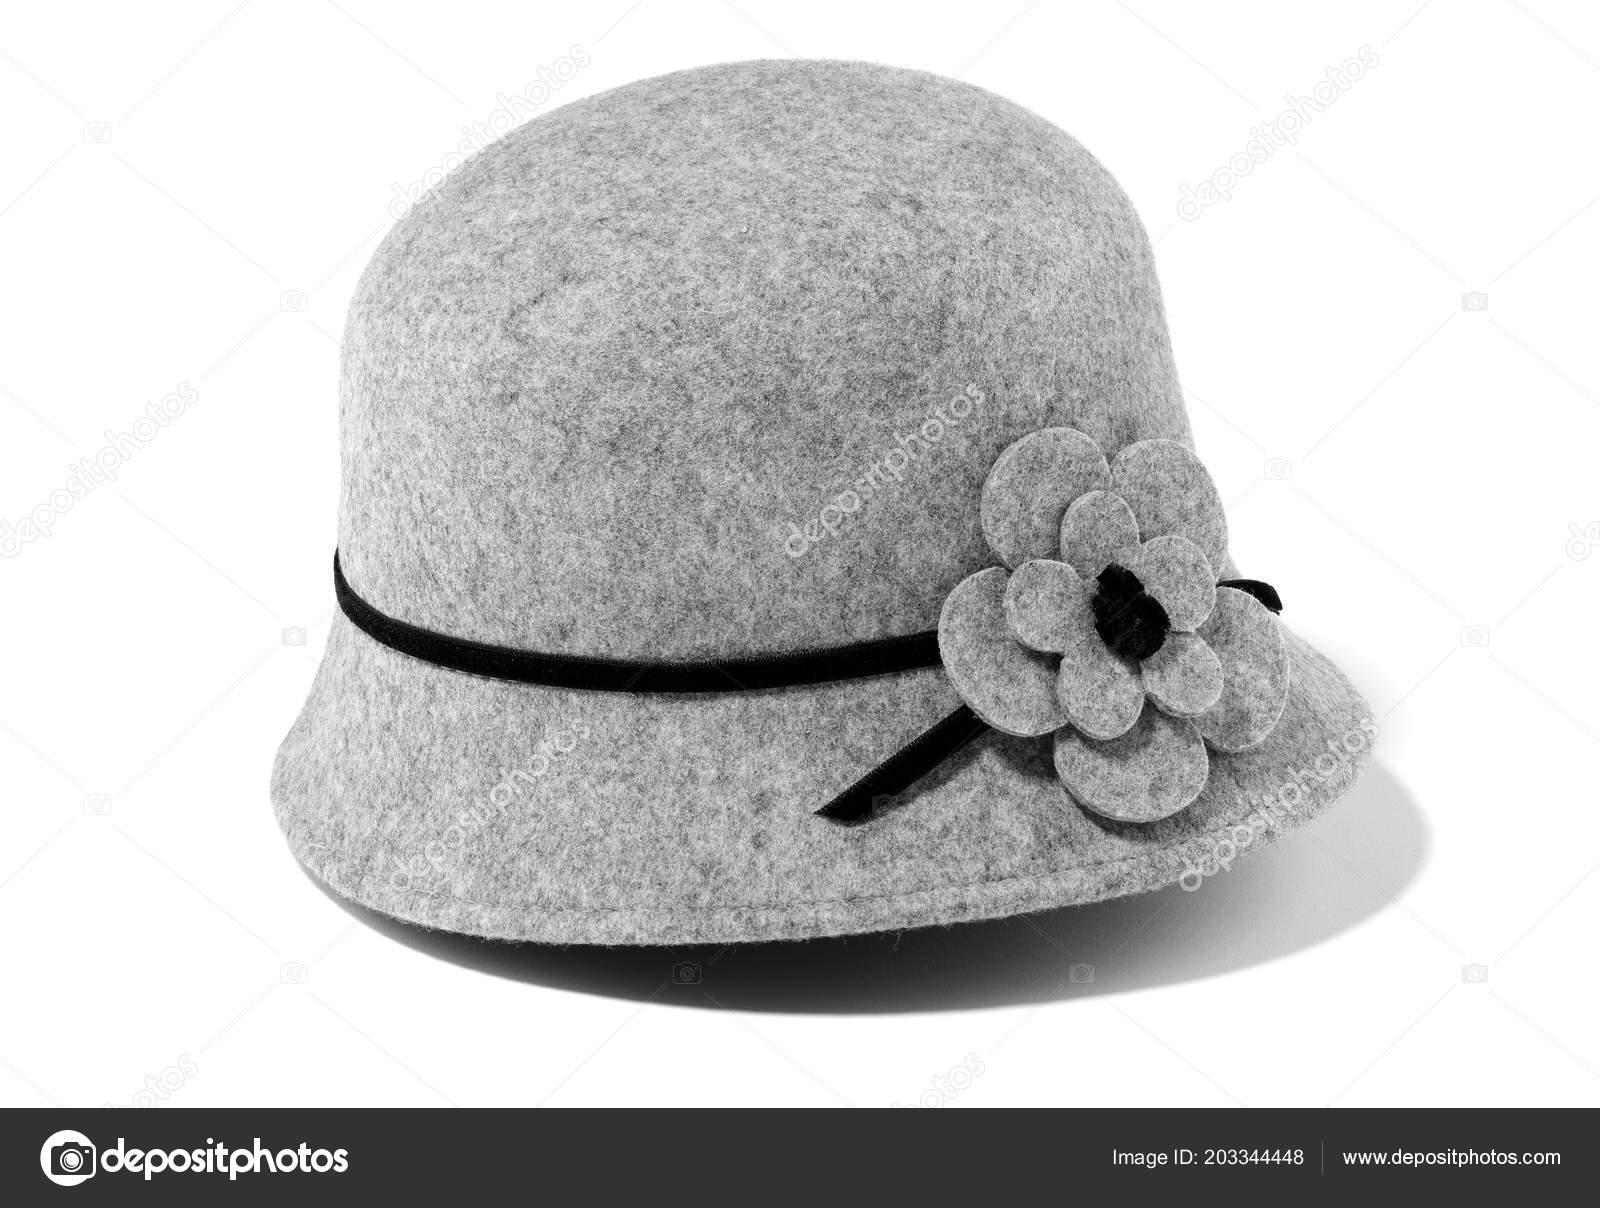 34db29c39c59f Classic Gray Felt Hat Woman Isolated — Stock Photo © estudiosaavedra ...